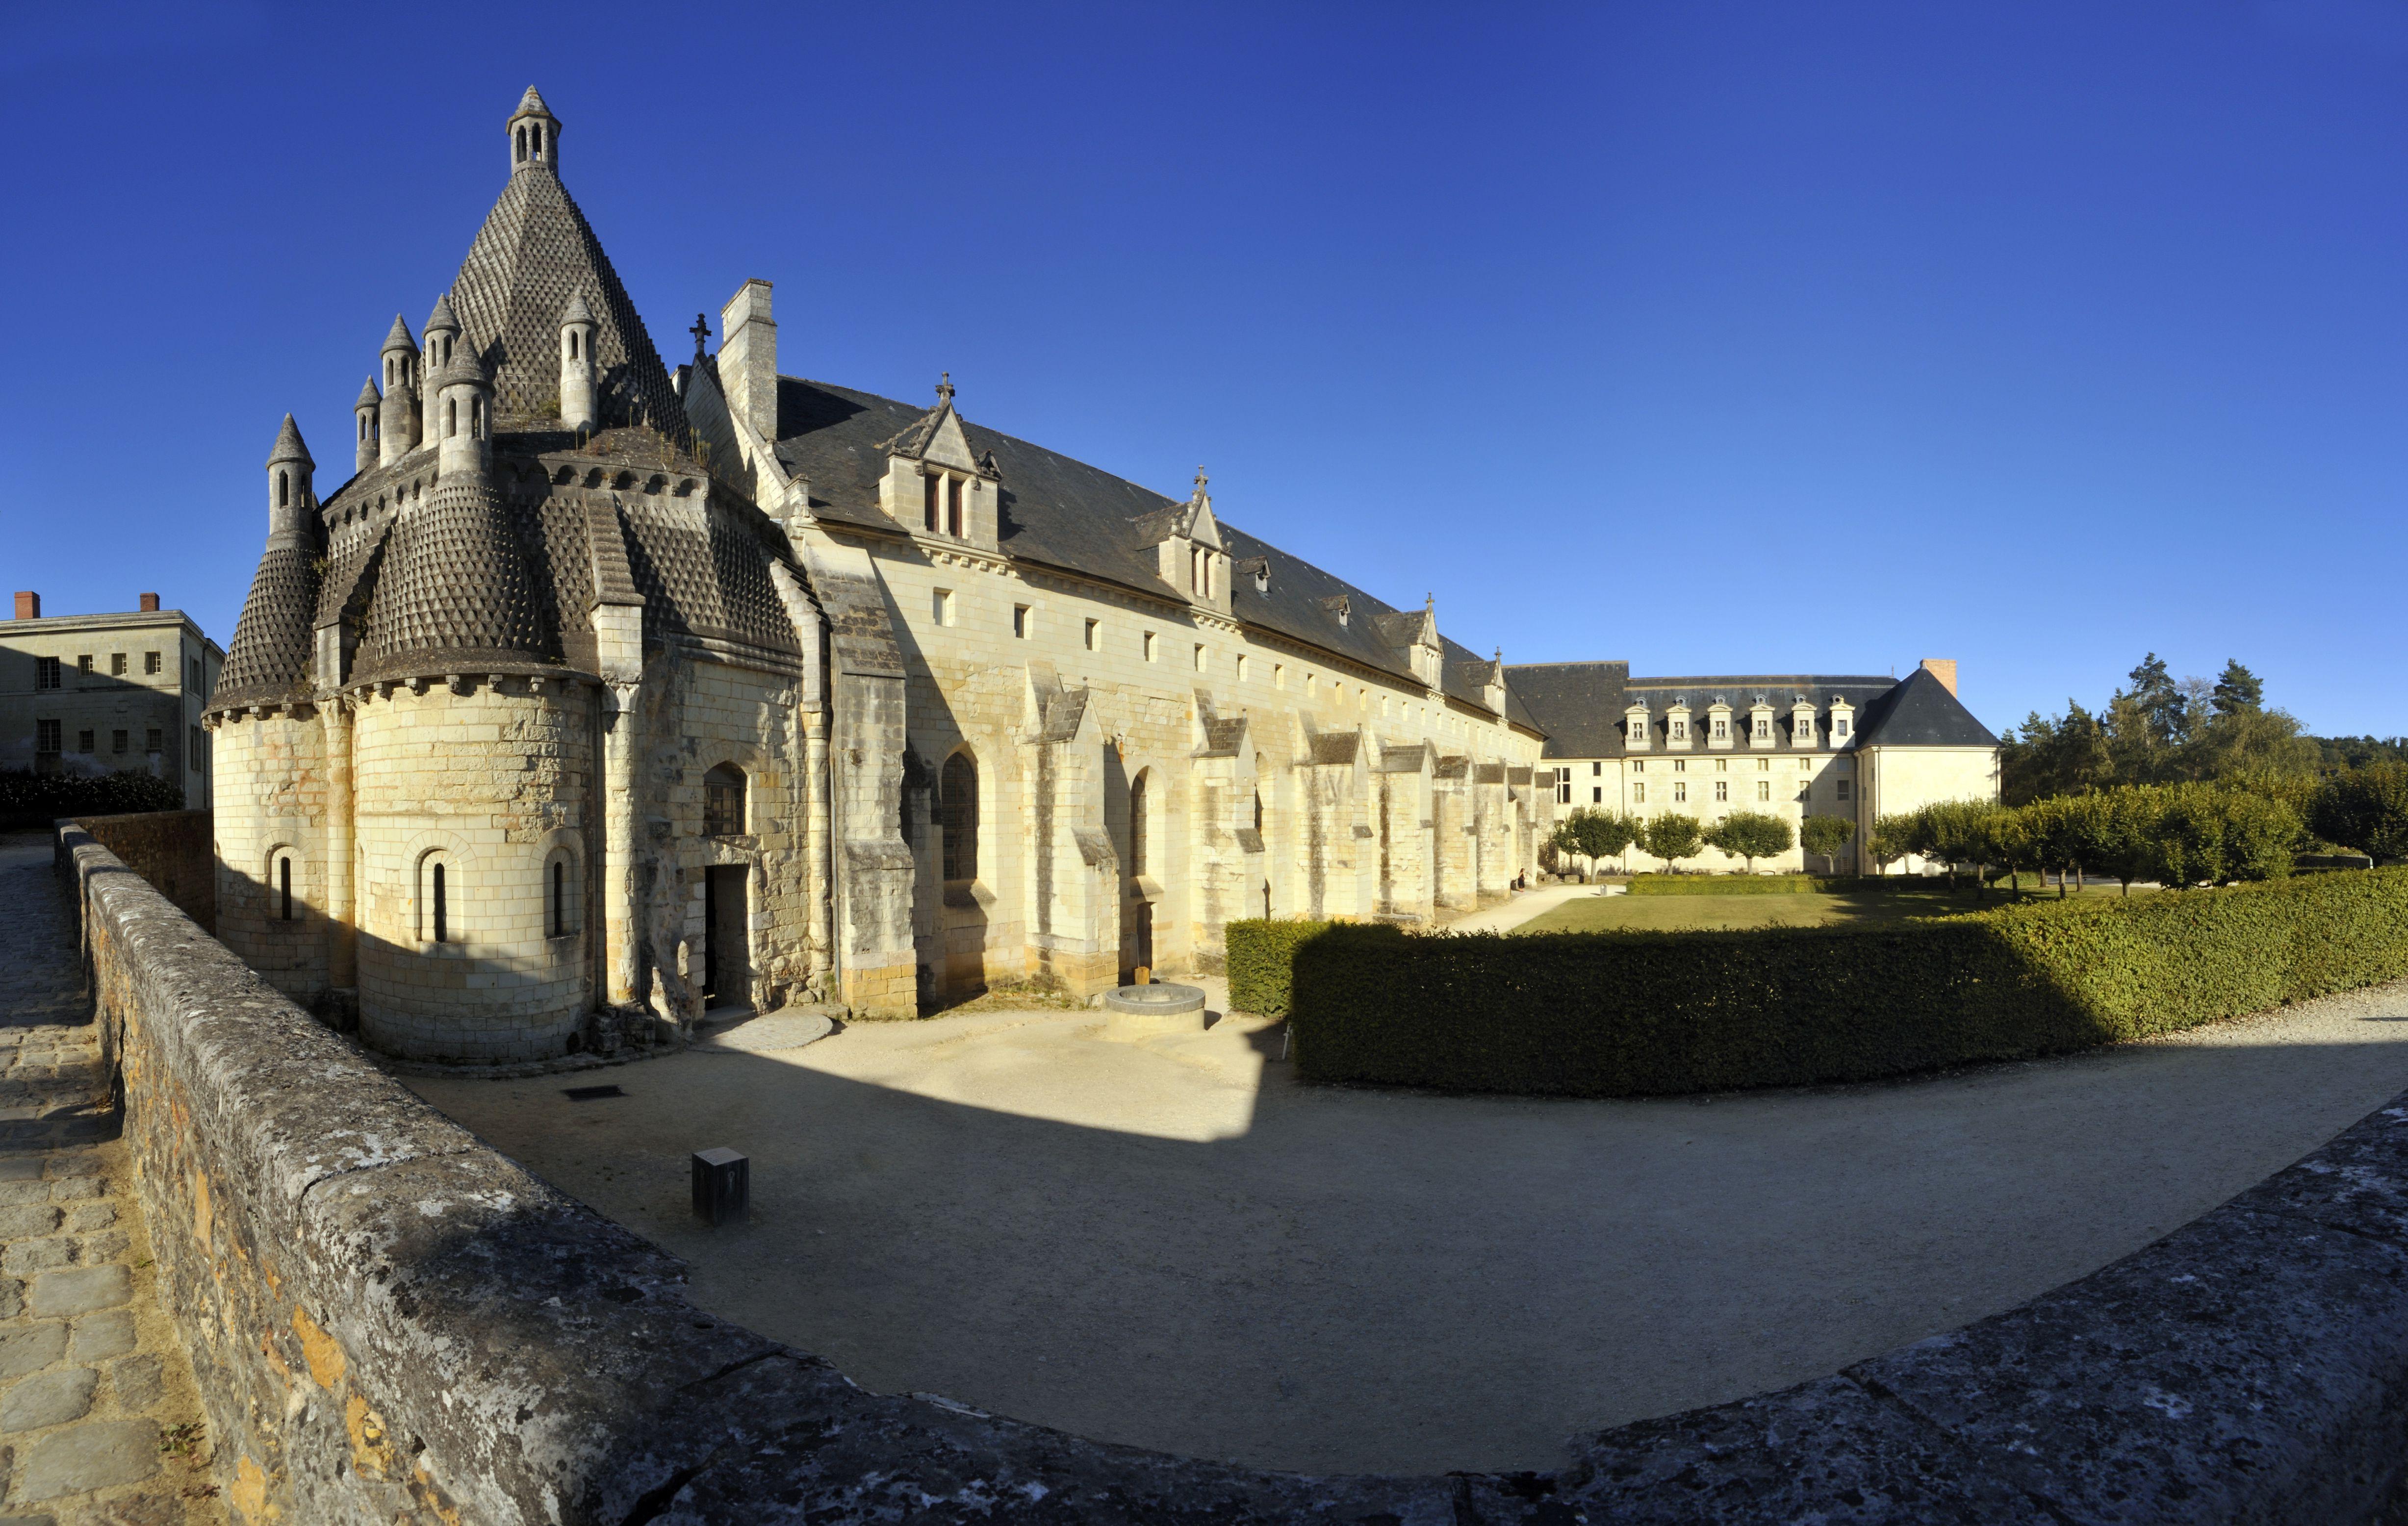 France, Maine et Loire, Loire Valley, Fontevraud Abbey against blue sky